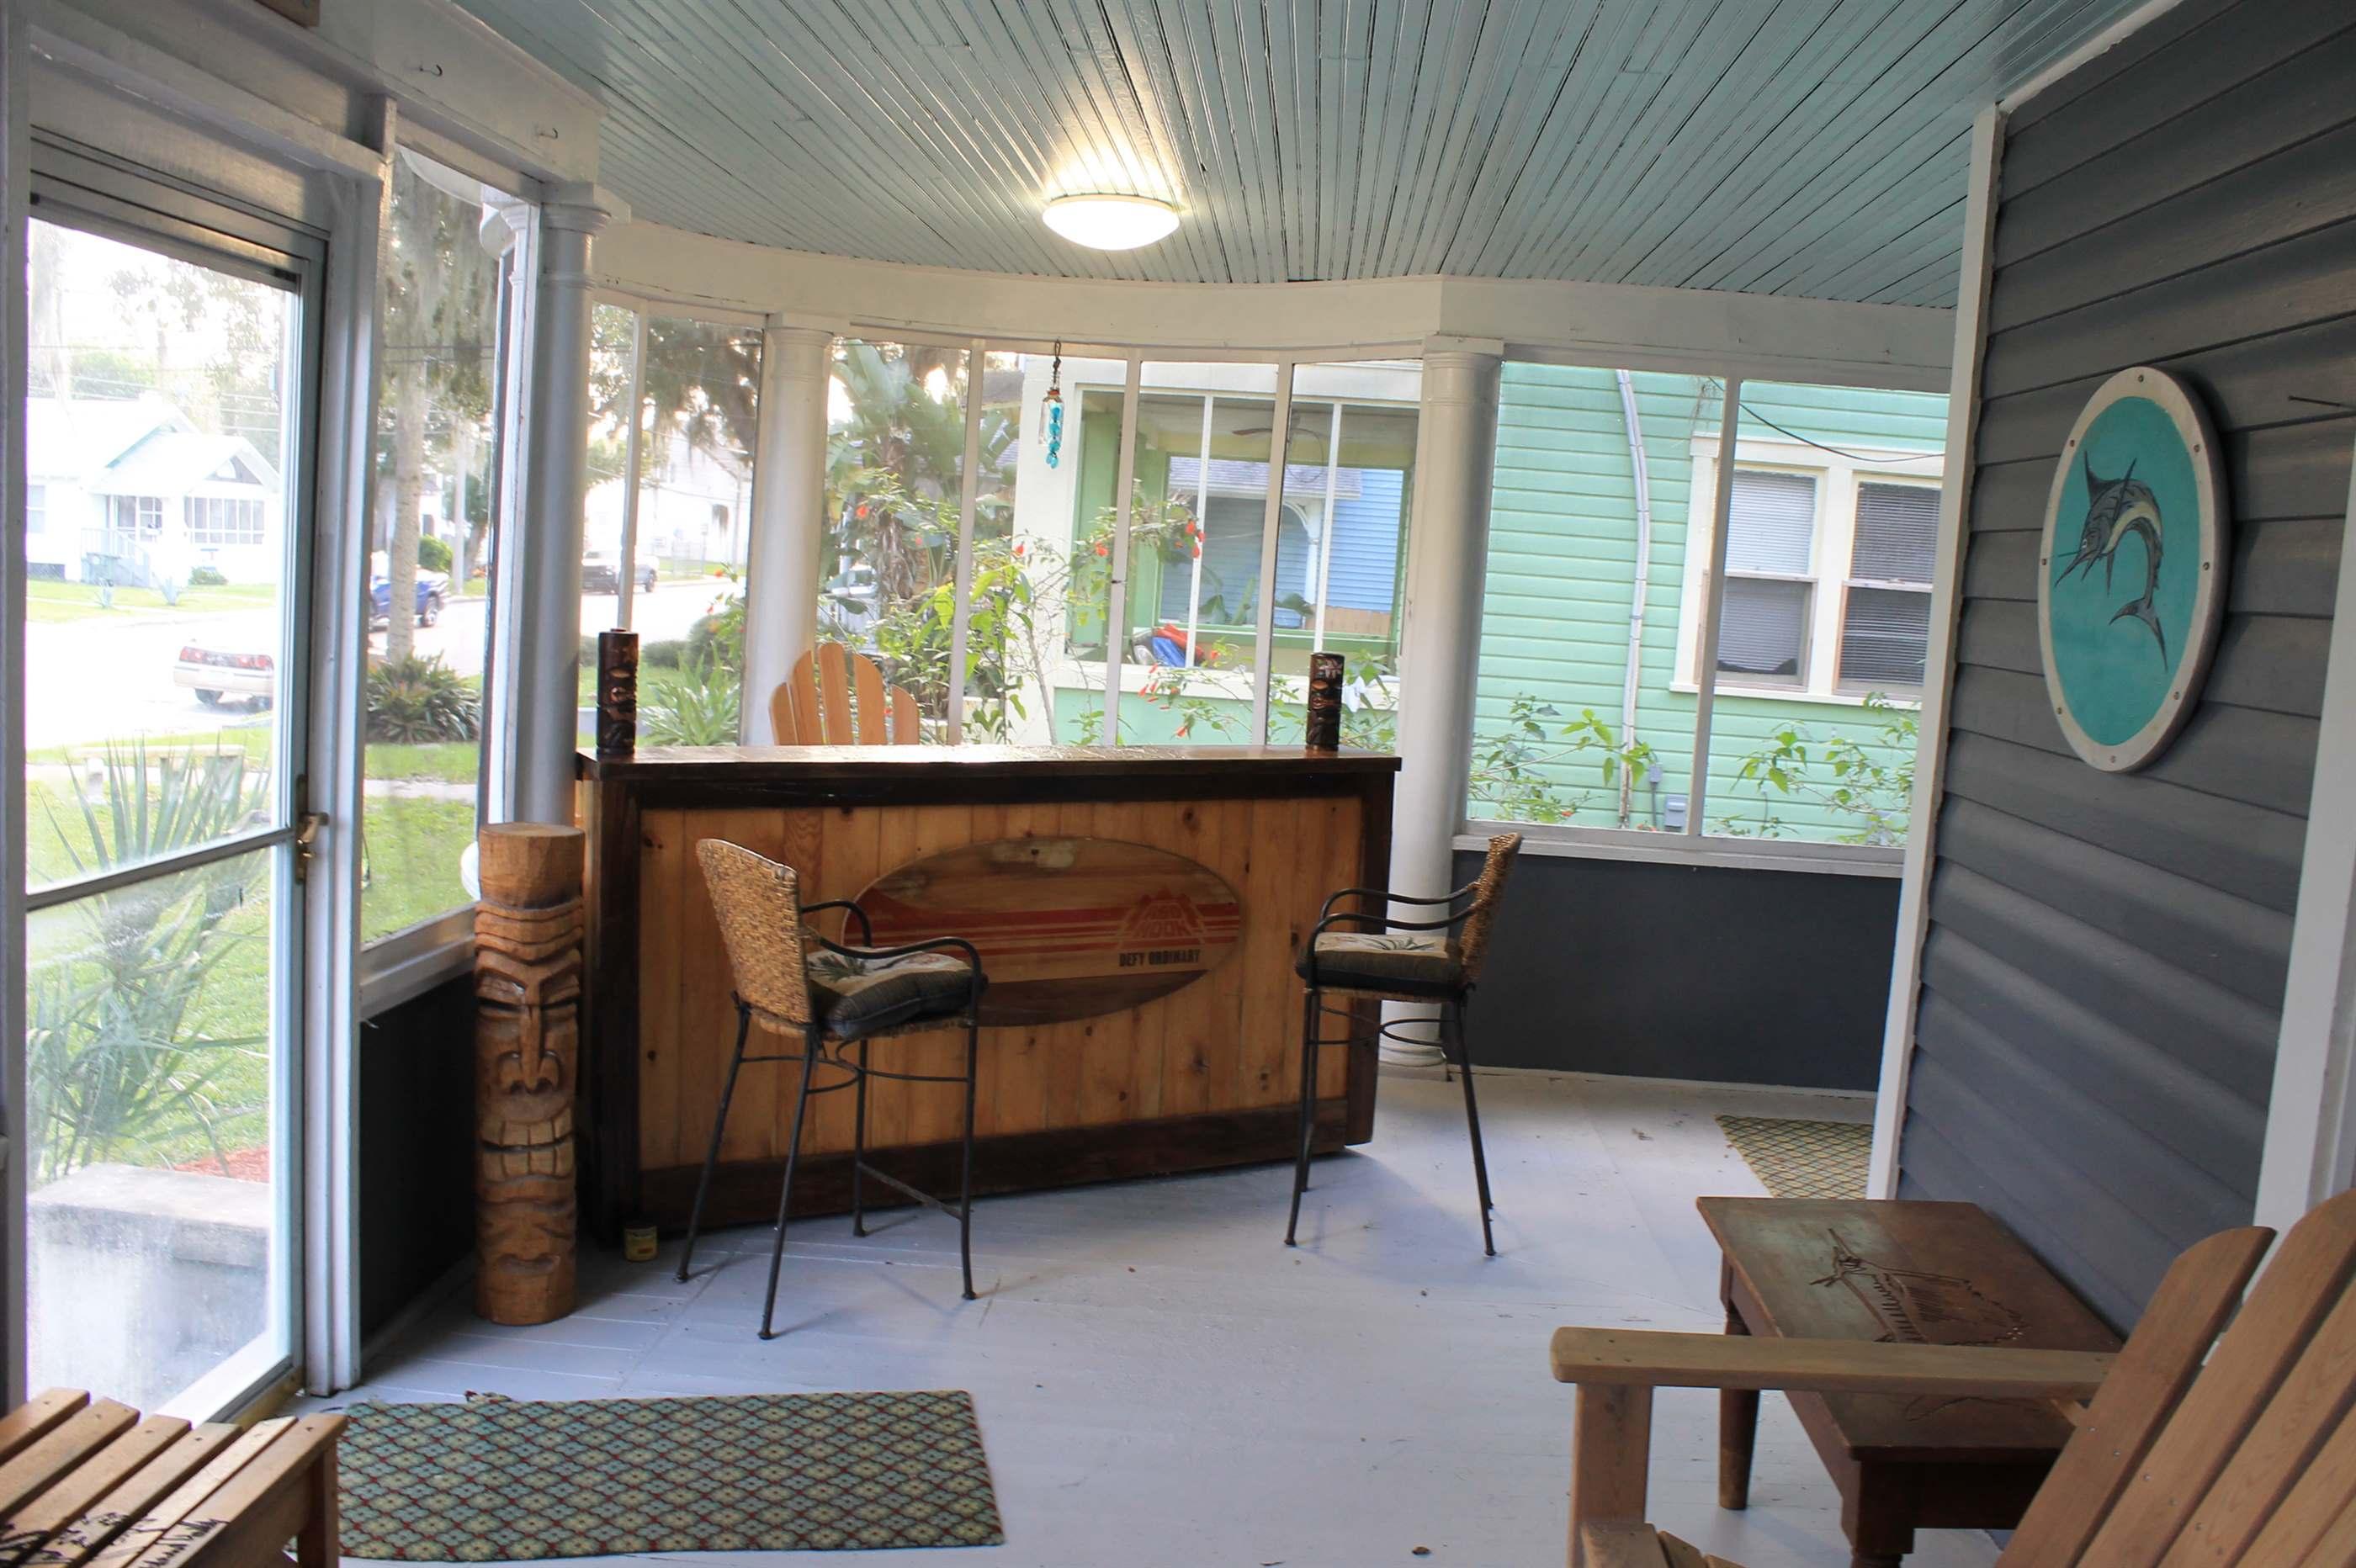 204 Fairview Ave, Daytona Beach, FL 32114